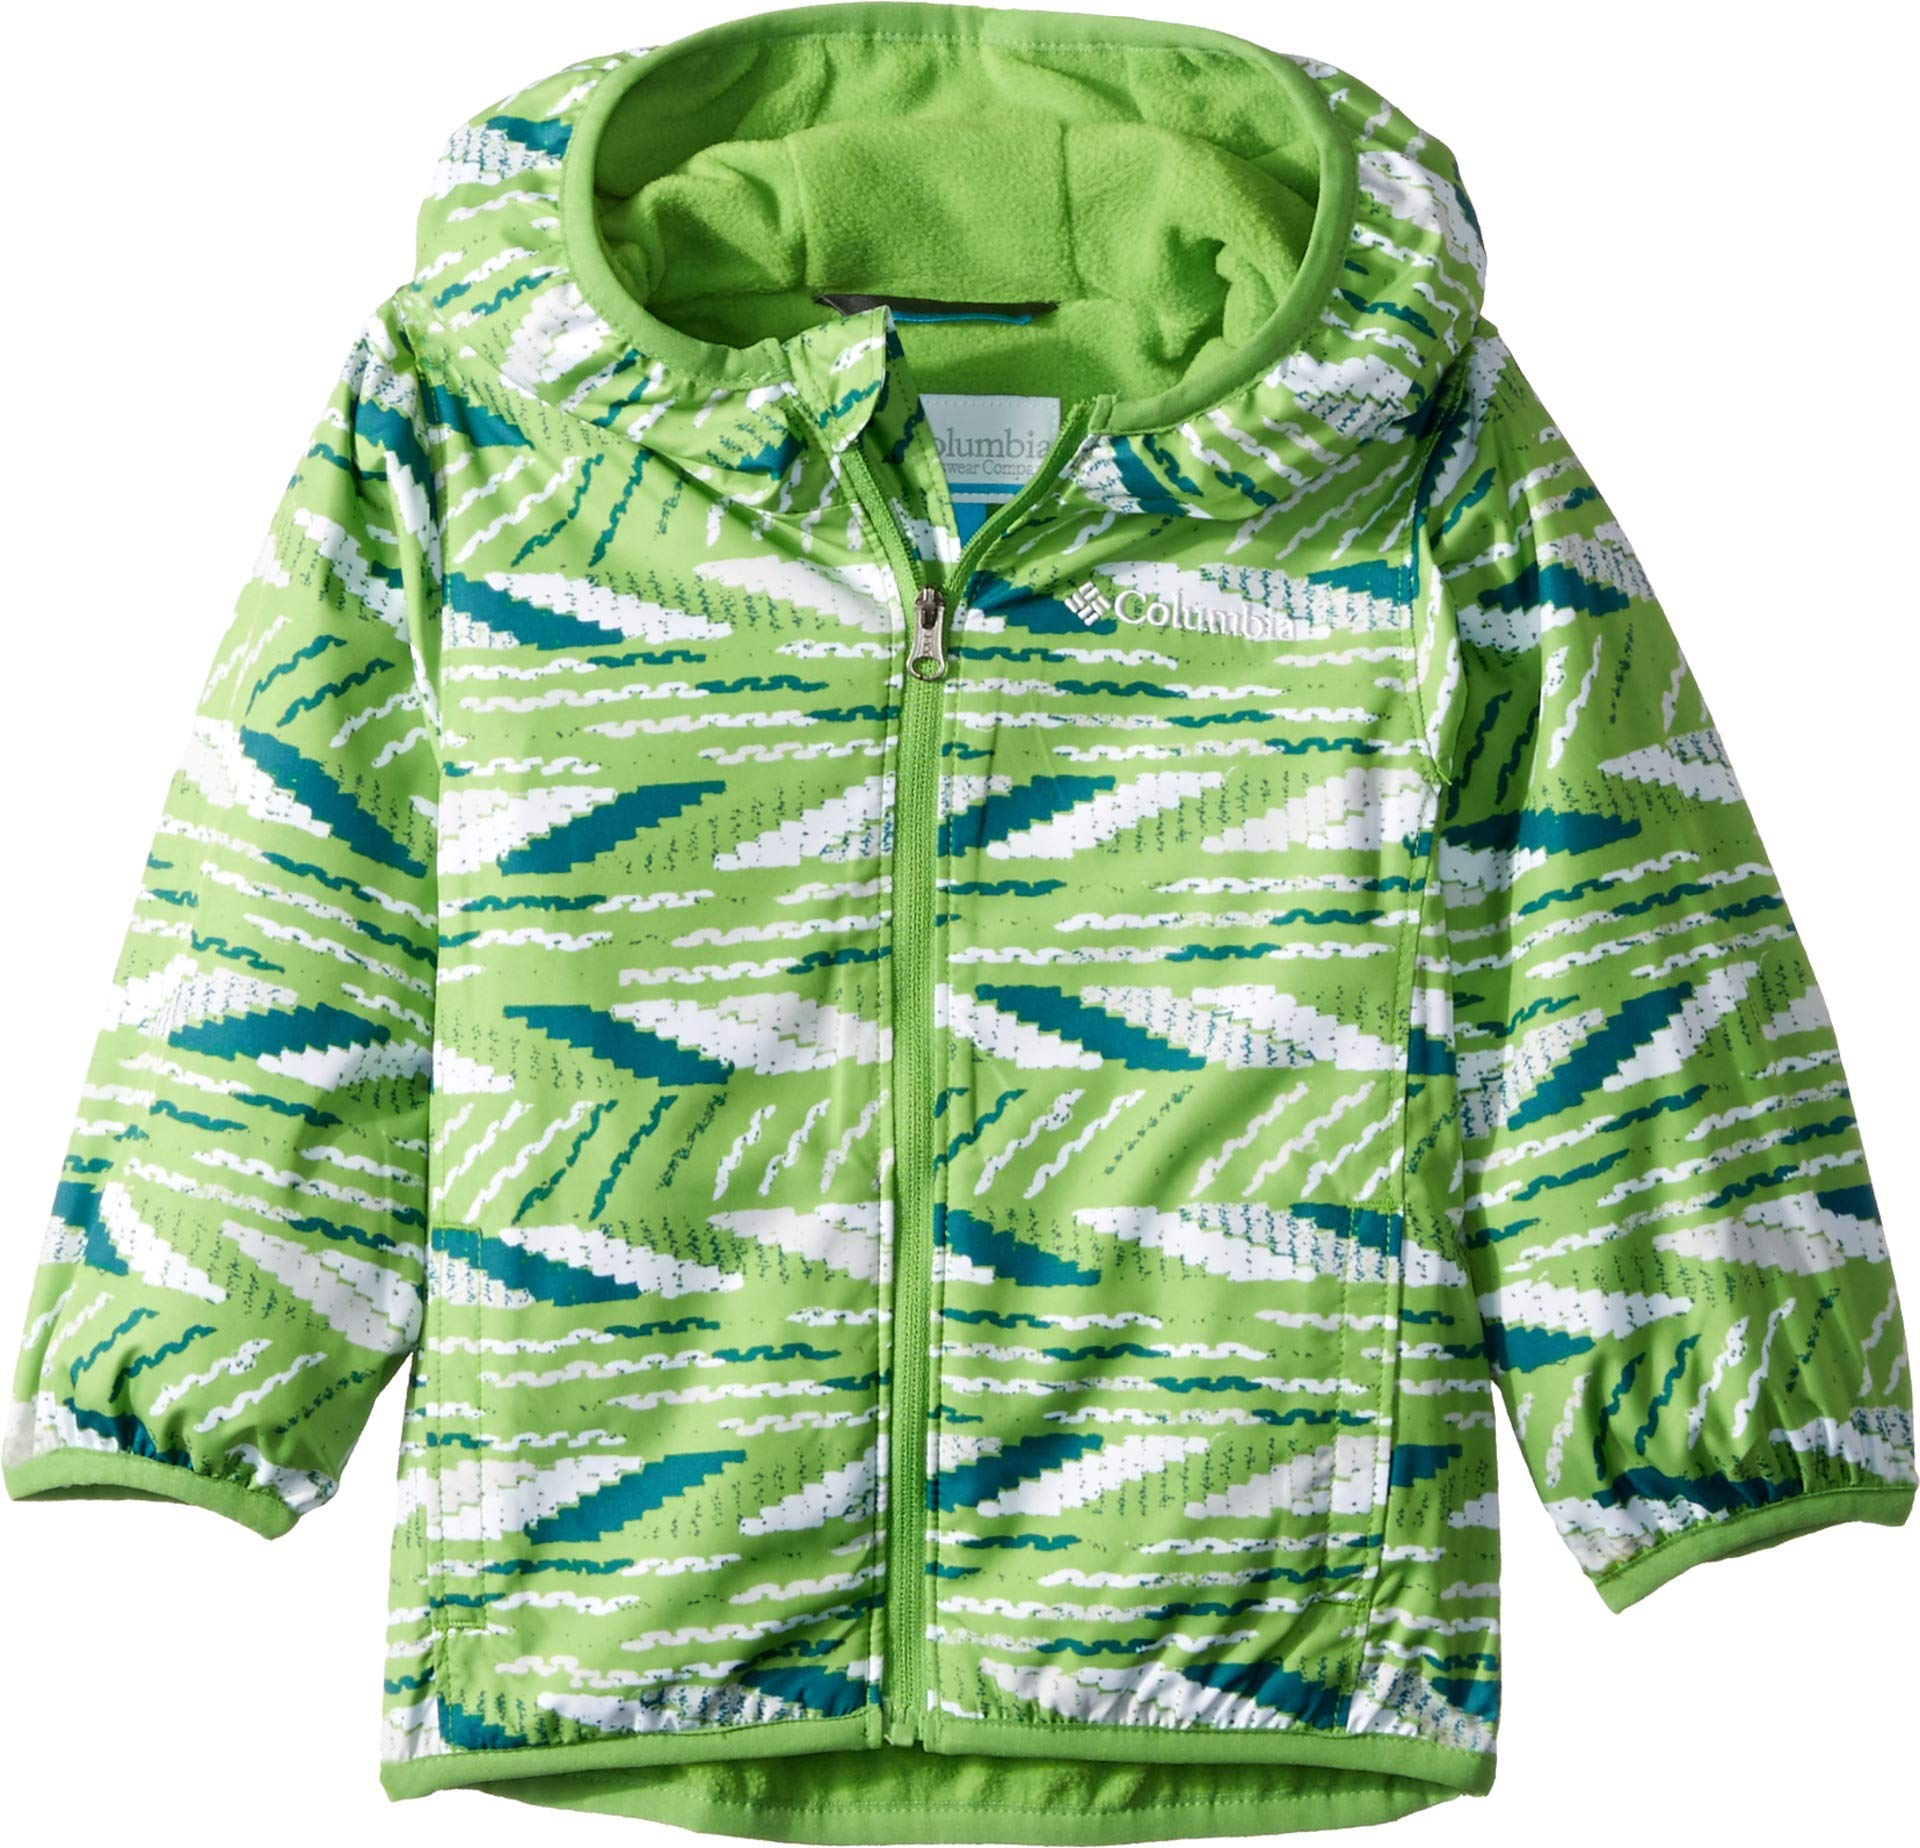 Columbia Kids Baby Boy's Mini Pixel Grabber¿ II Wind Jacket (Infant/Toddler) Cyber Green Beach Stripe 2T Toddler